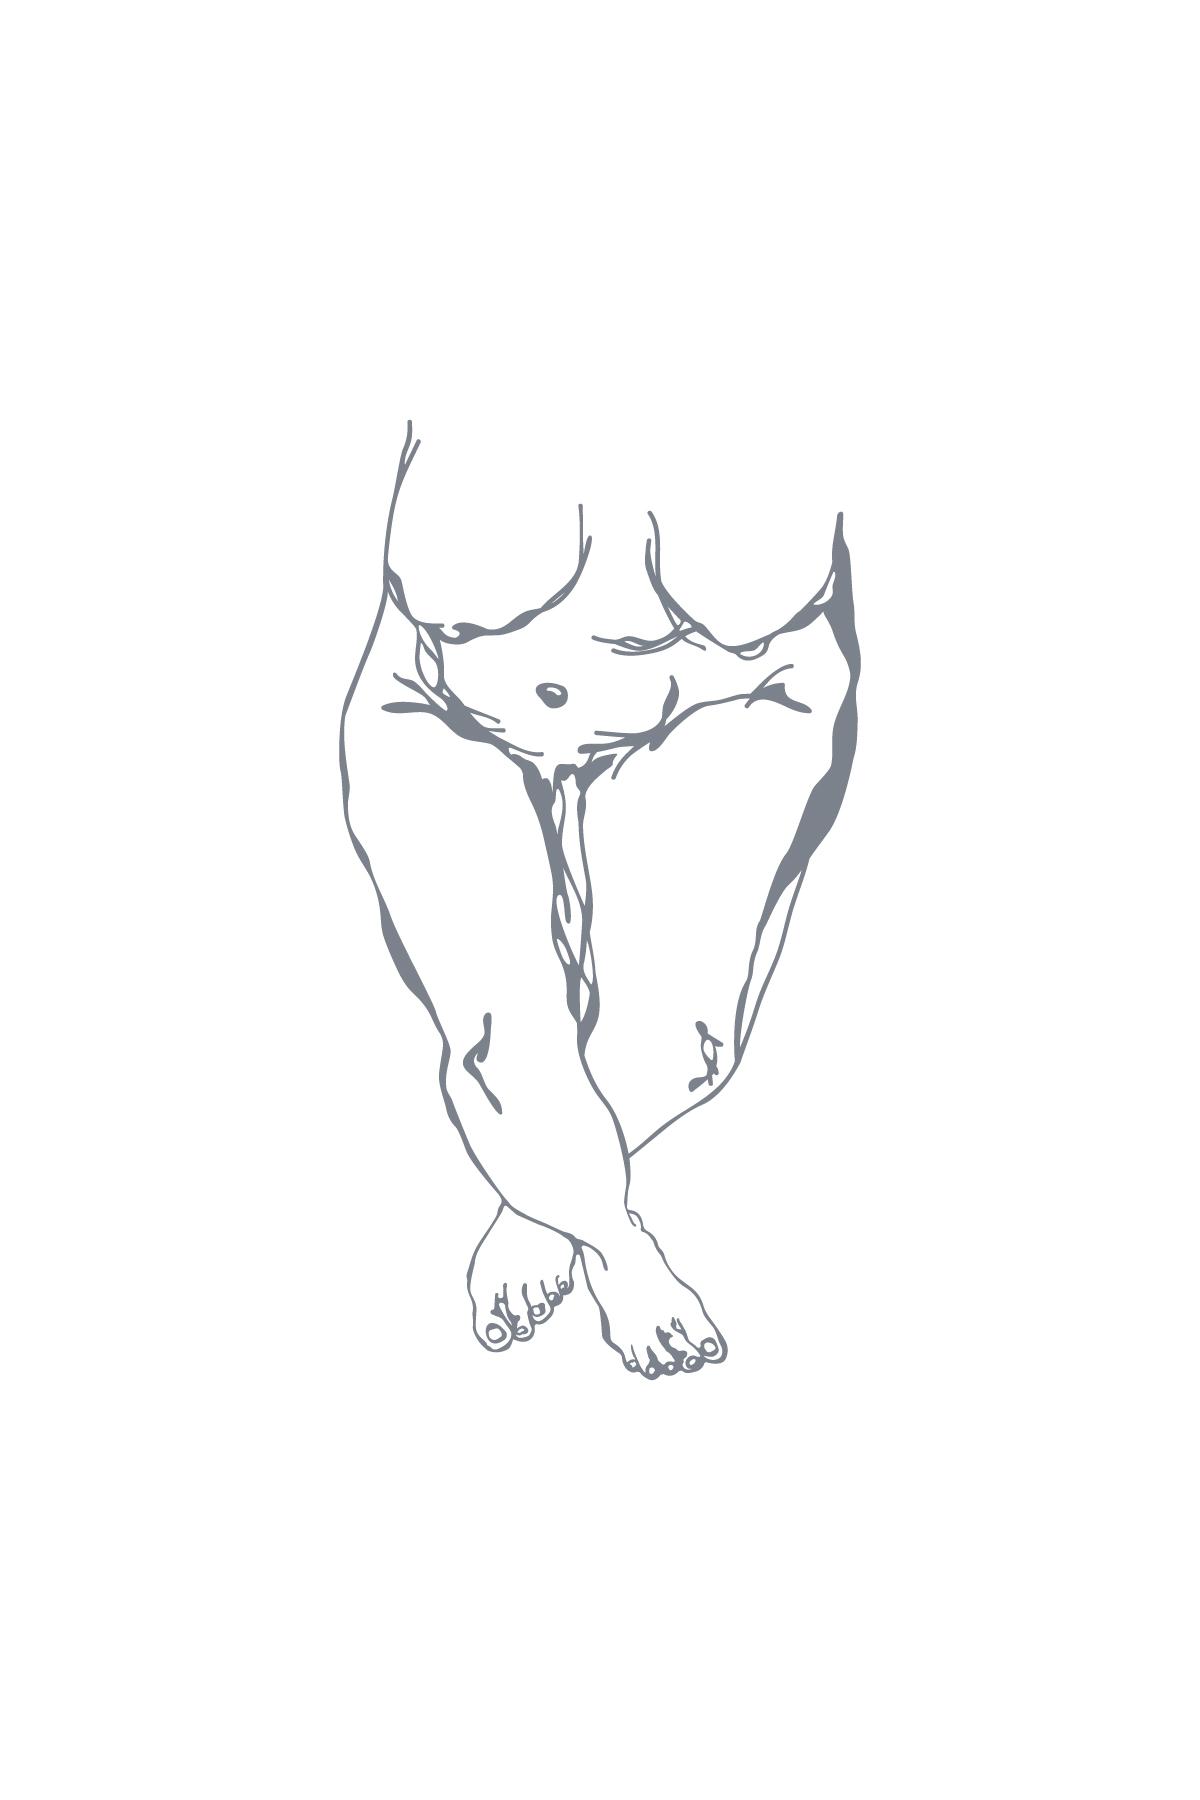 body2-02.jpg